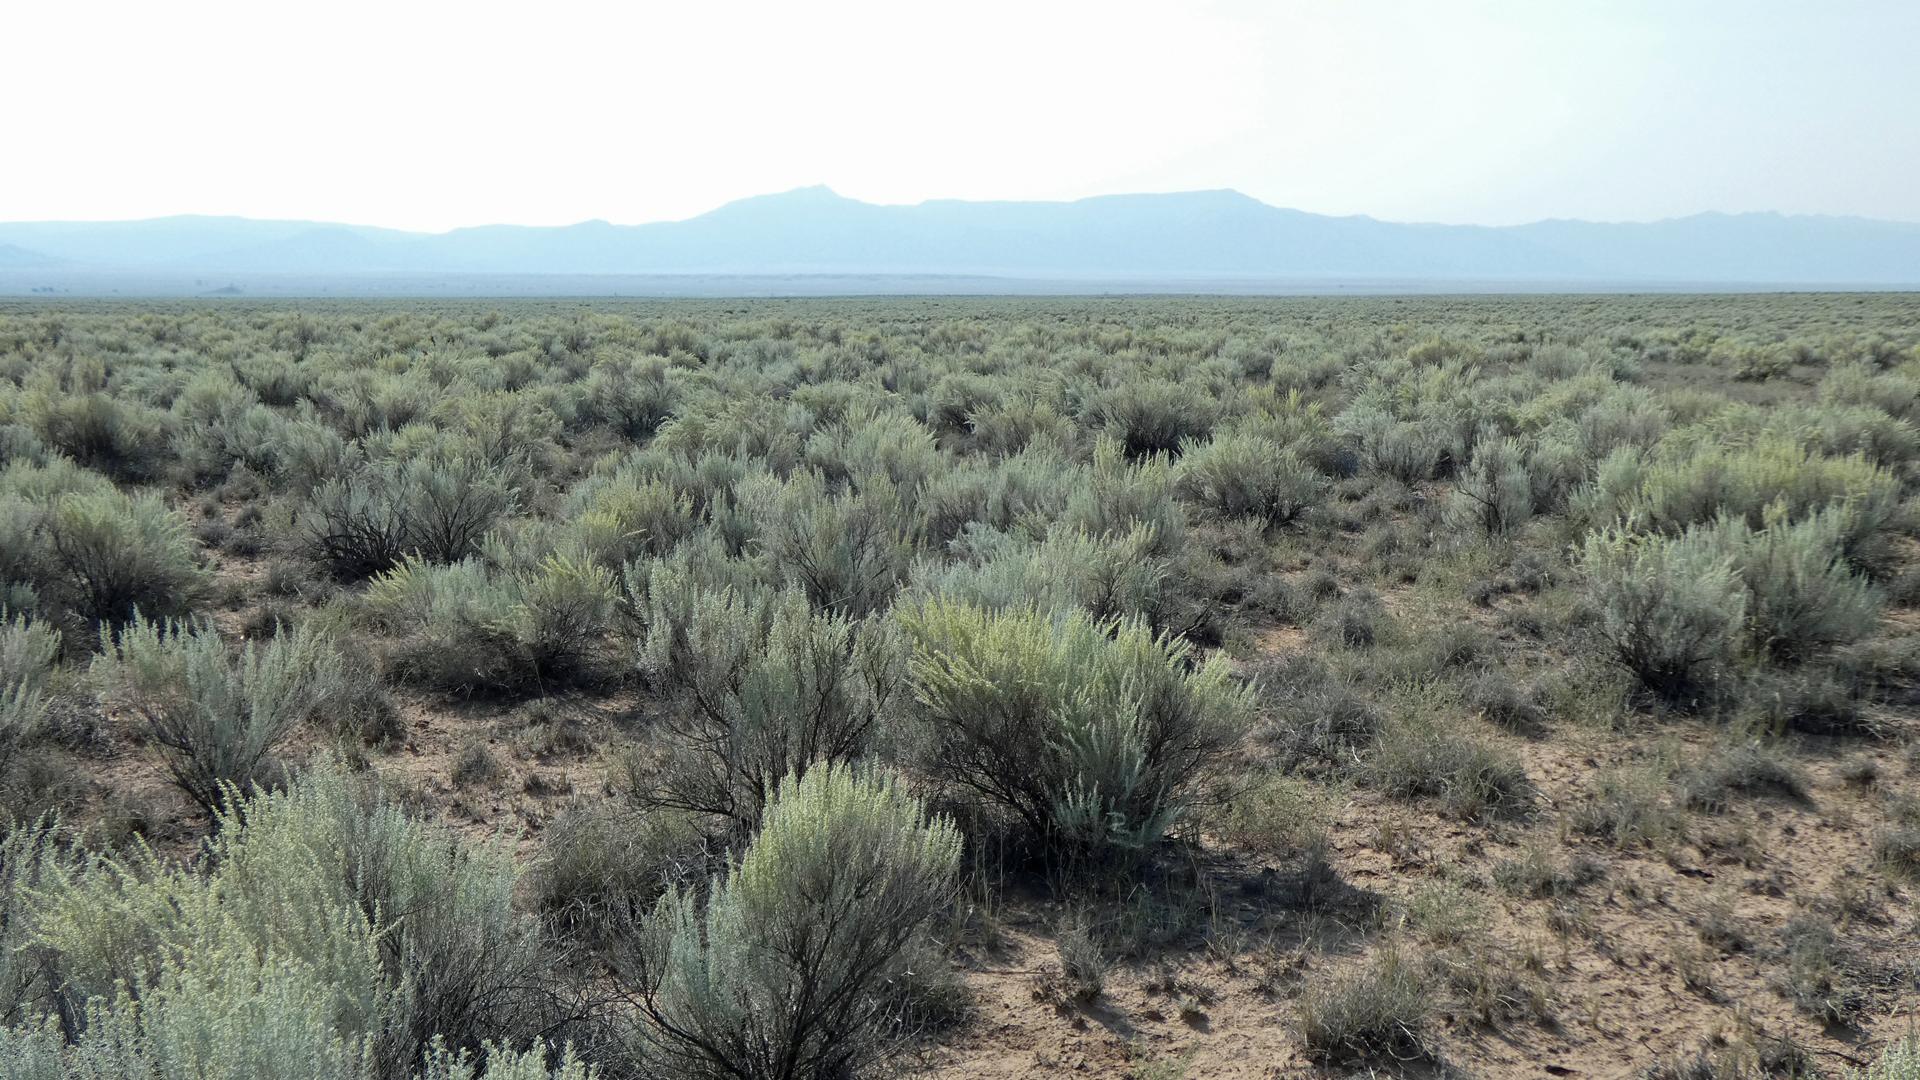 Mesa del Sol, Albuquerque, August 2020